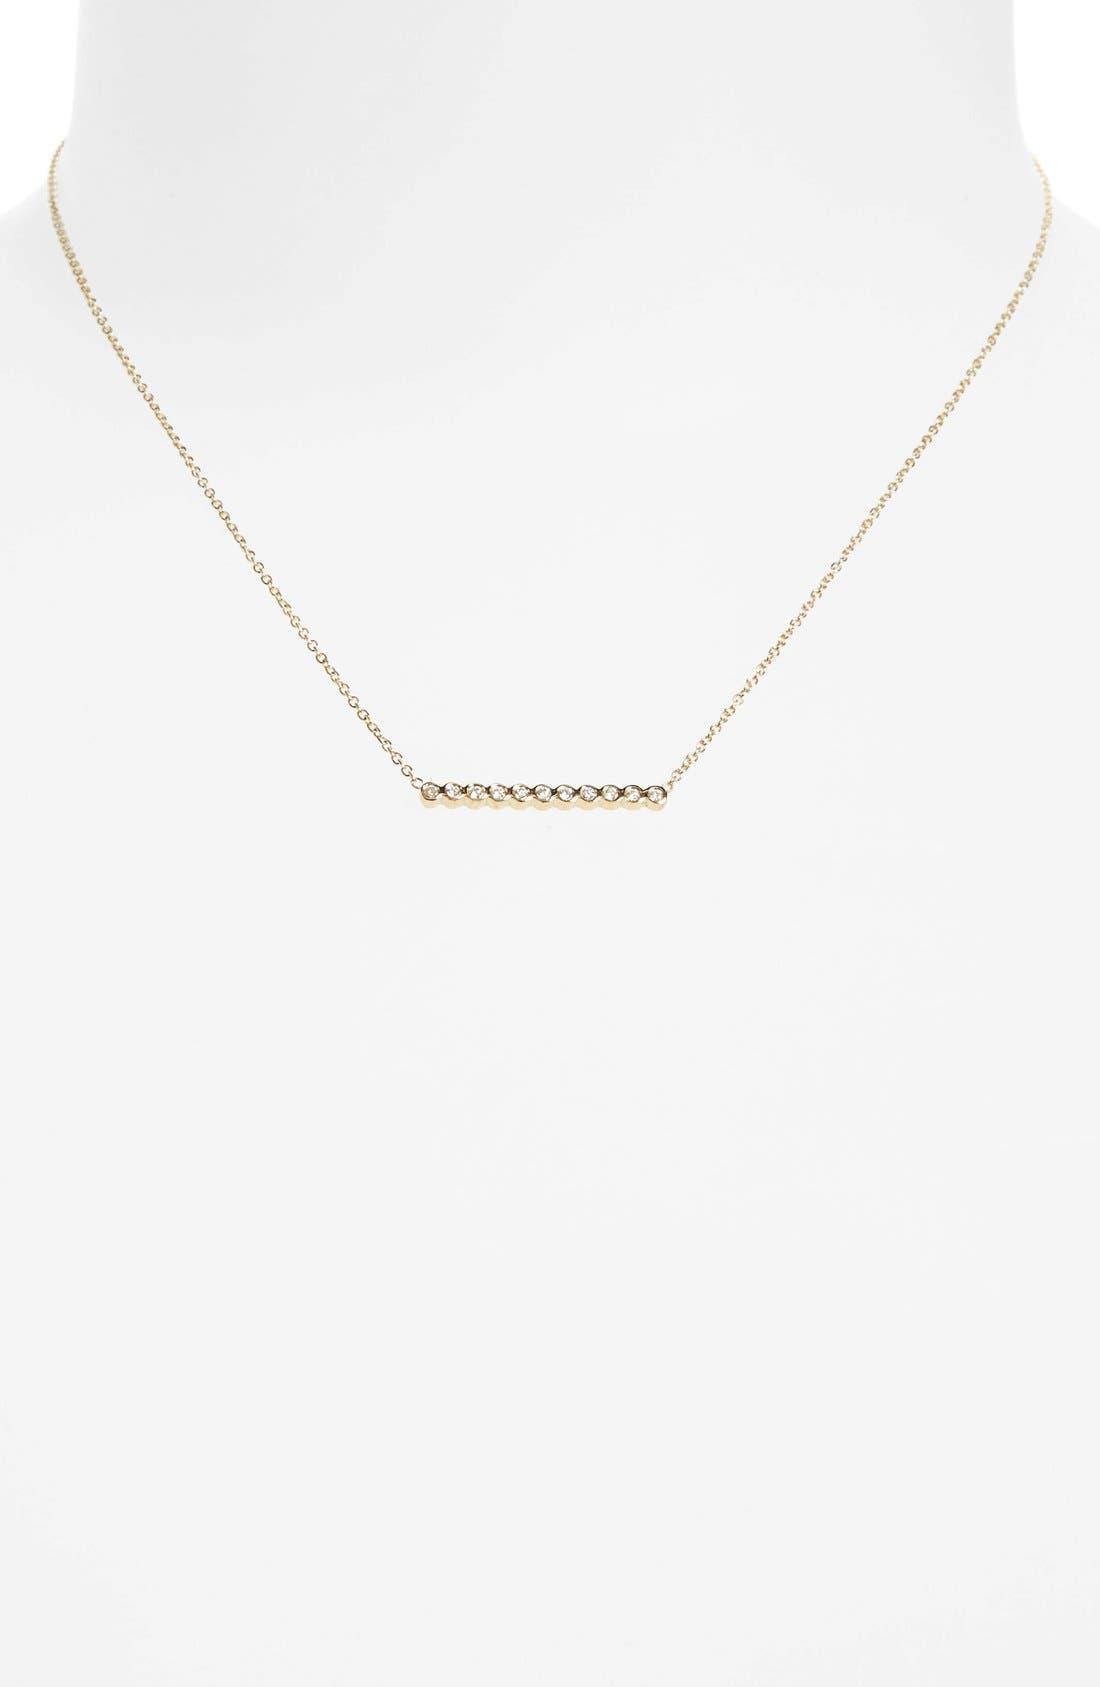 Diamond Bar Pendant Necklace,                             Alternate thumbnail 4, color,                             YELLOW GOLD